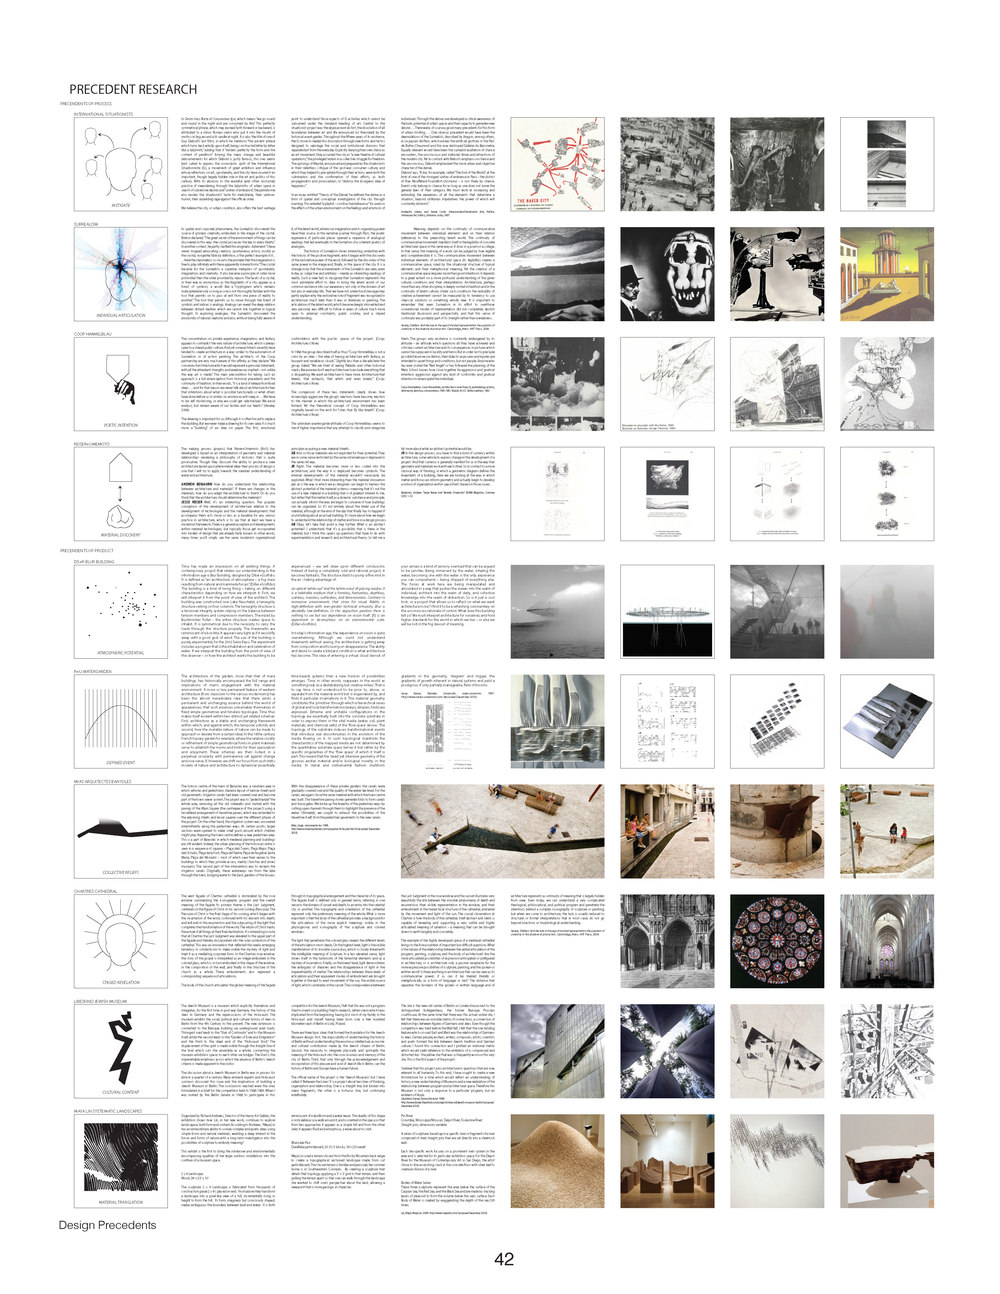 GAVIN JOHNS PORTFOLIO 01-11-12_Page_042.jpg